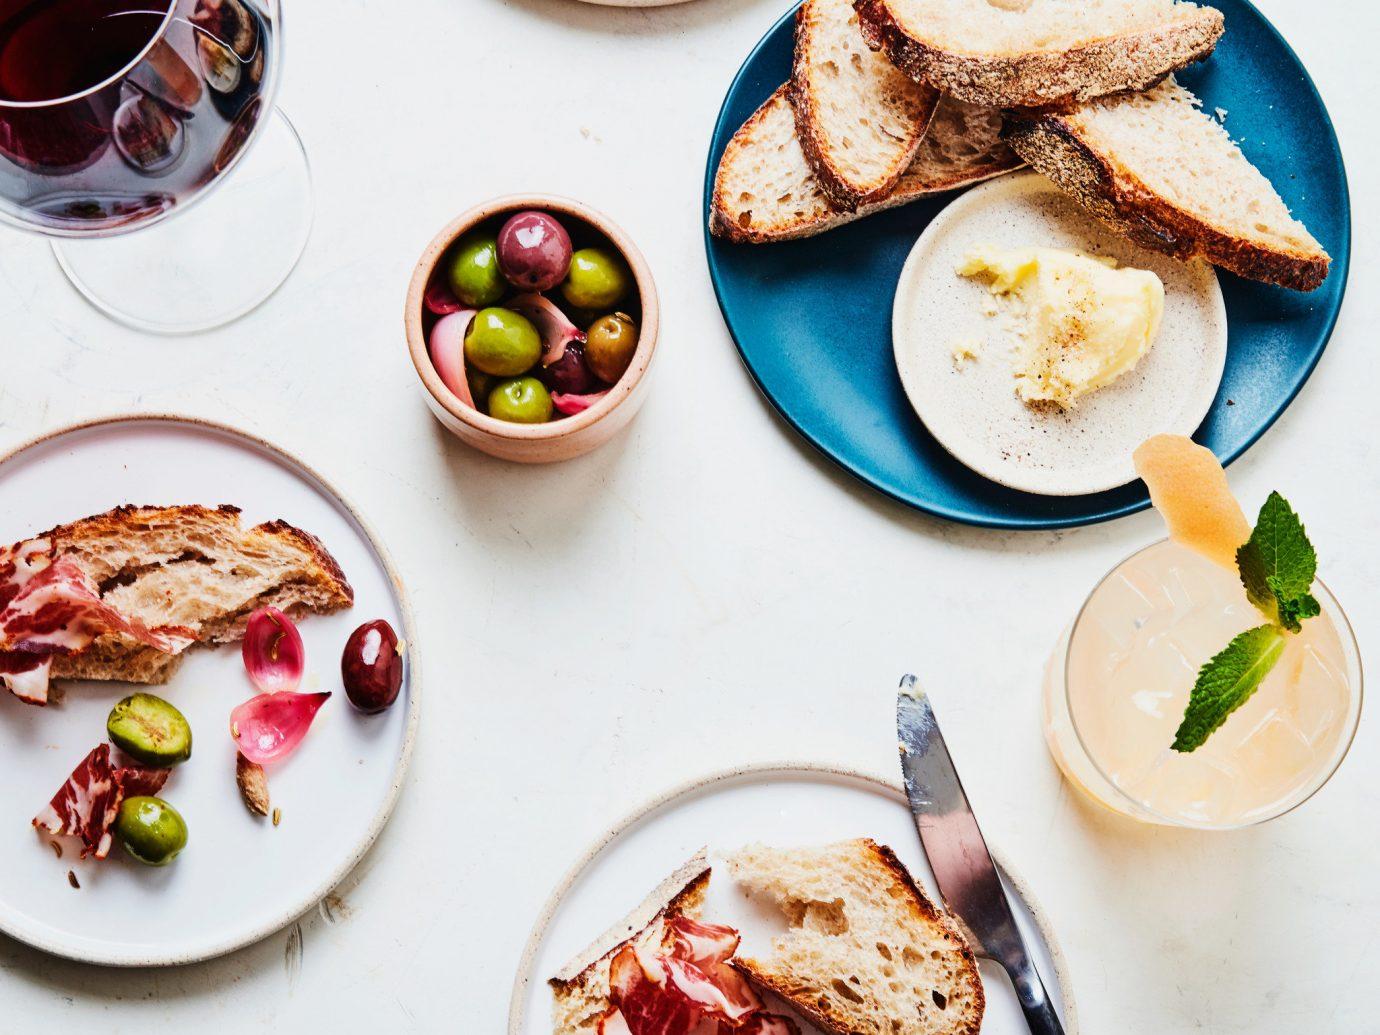 NYC Trip Ideas plate meal food appetizer breakfast brunch dish tableware dessert full breakfast cuisine recipe platter finger food different several